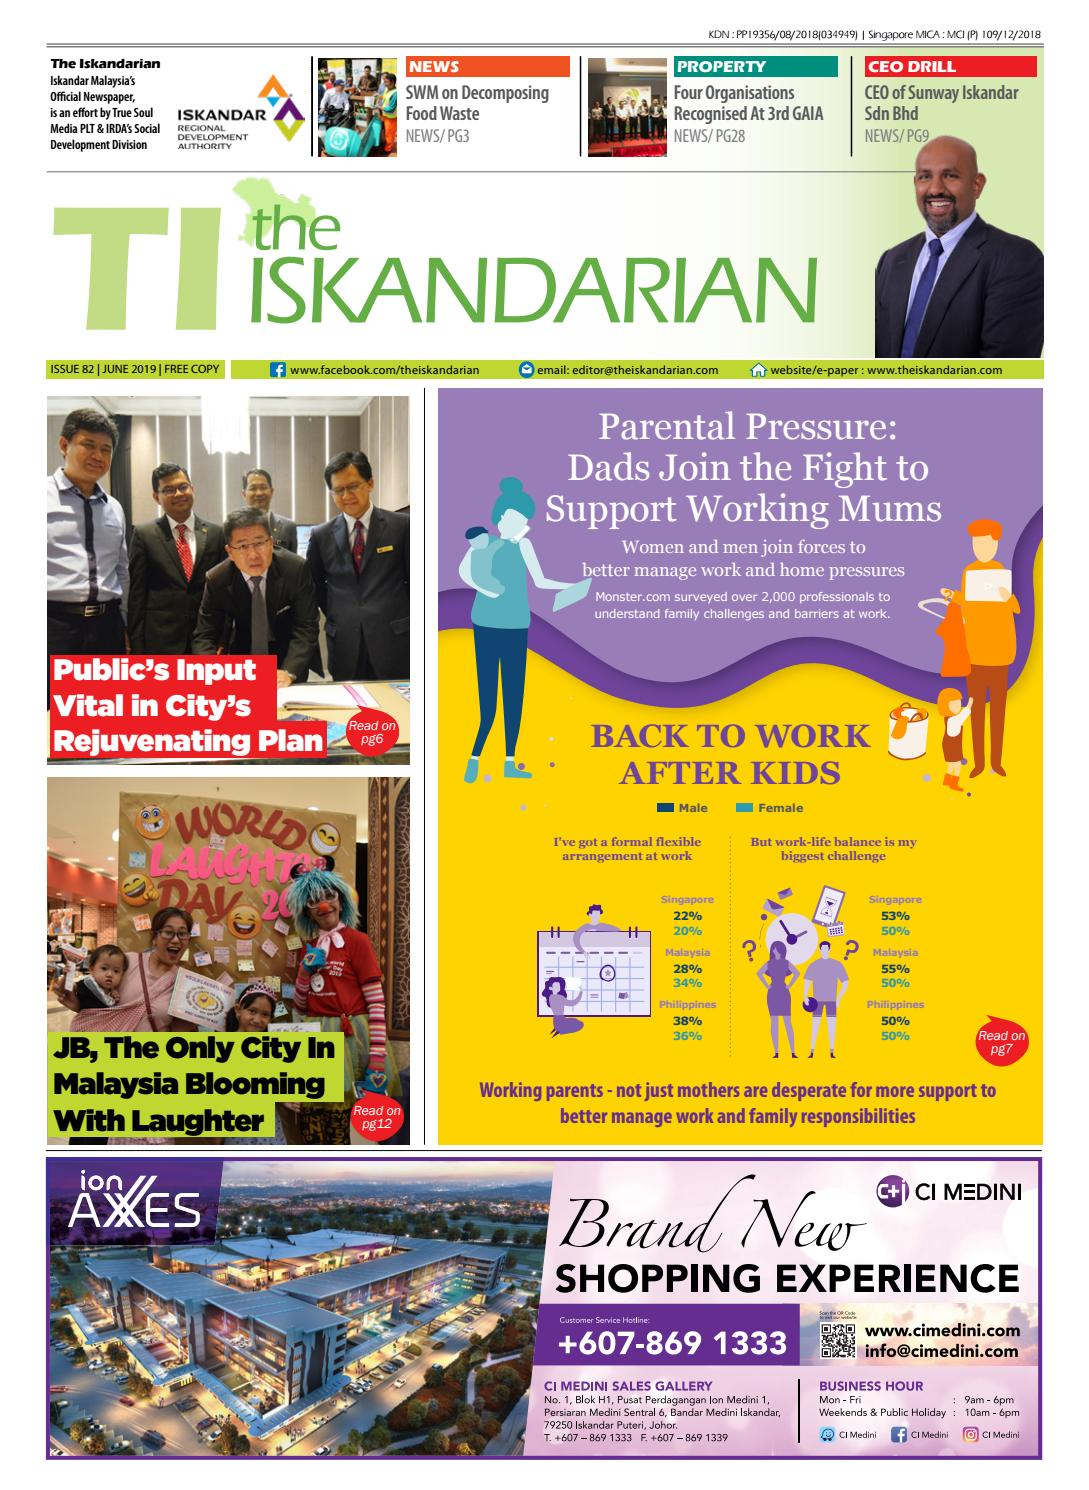 The Iskandarian E-Paper June 2019 by The Iskandarian-WAVES Lifestyle